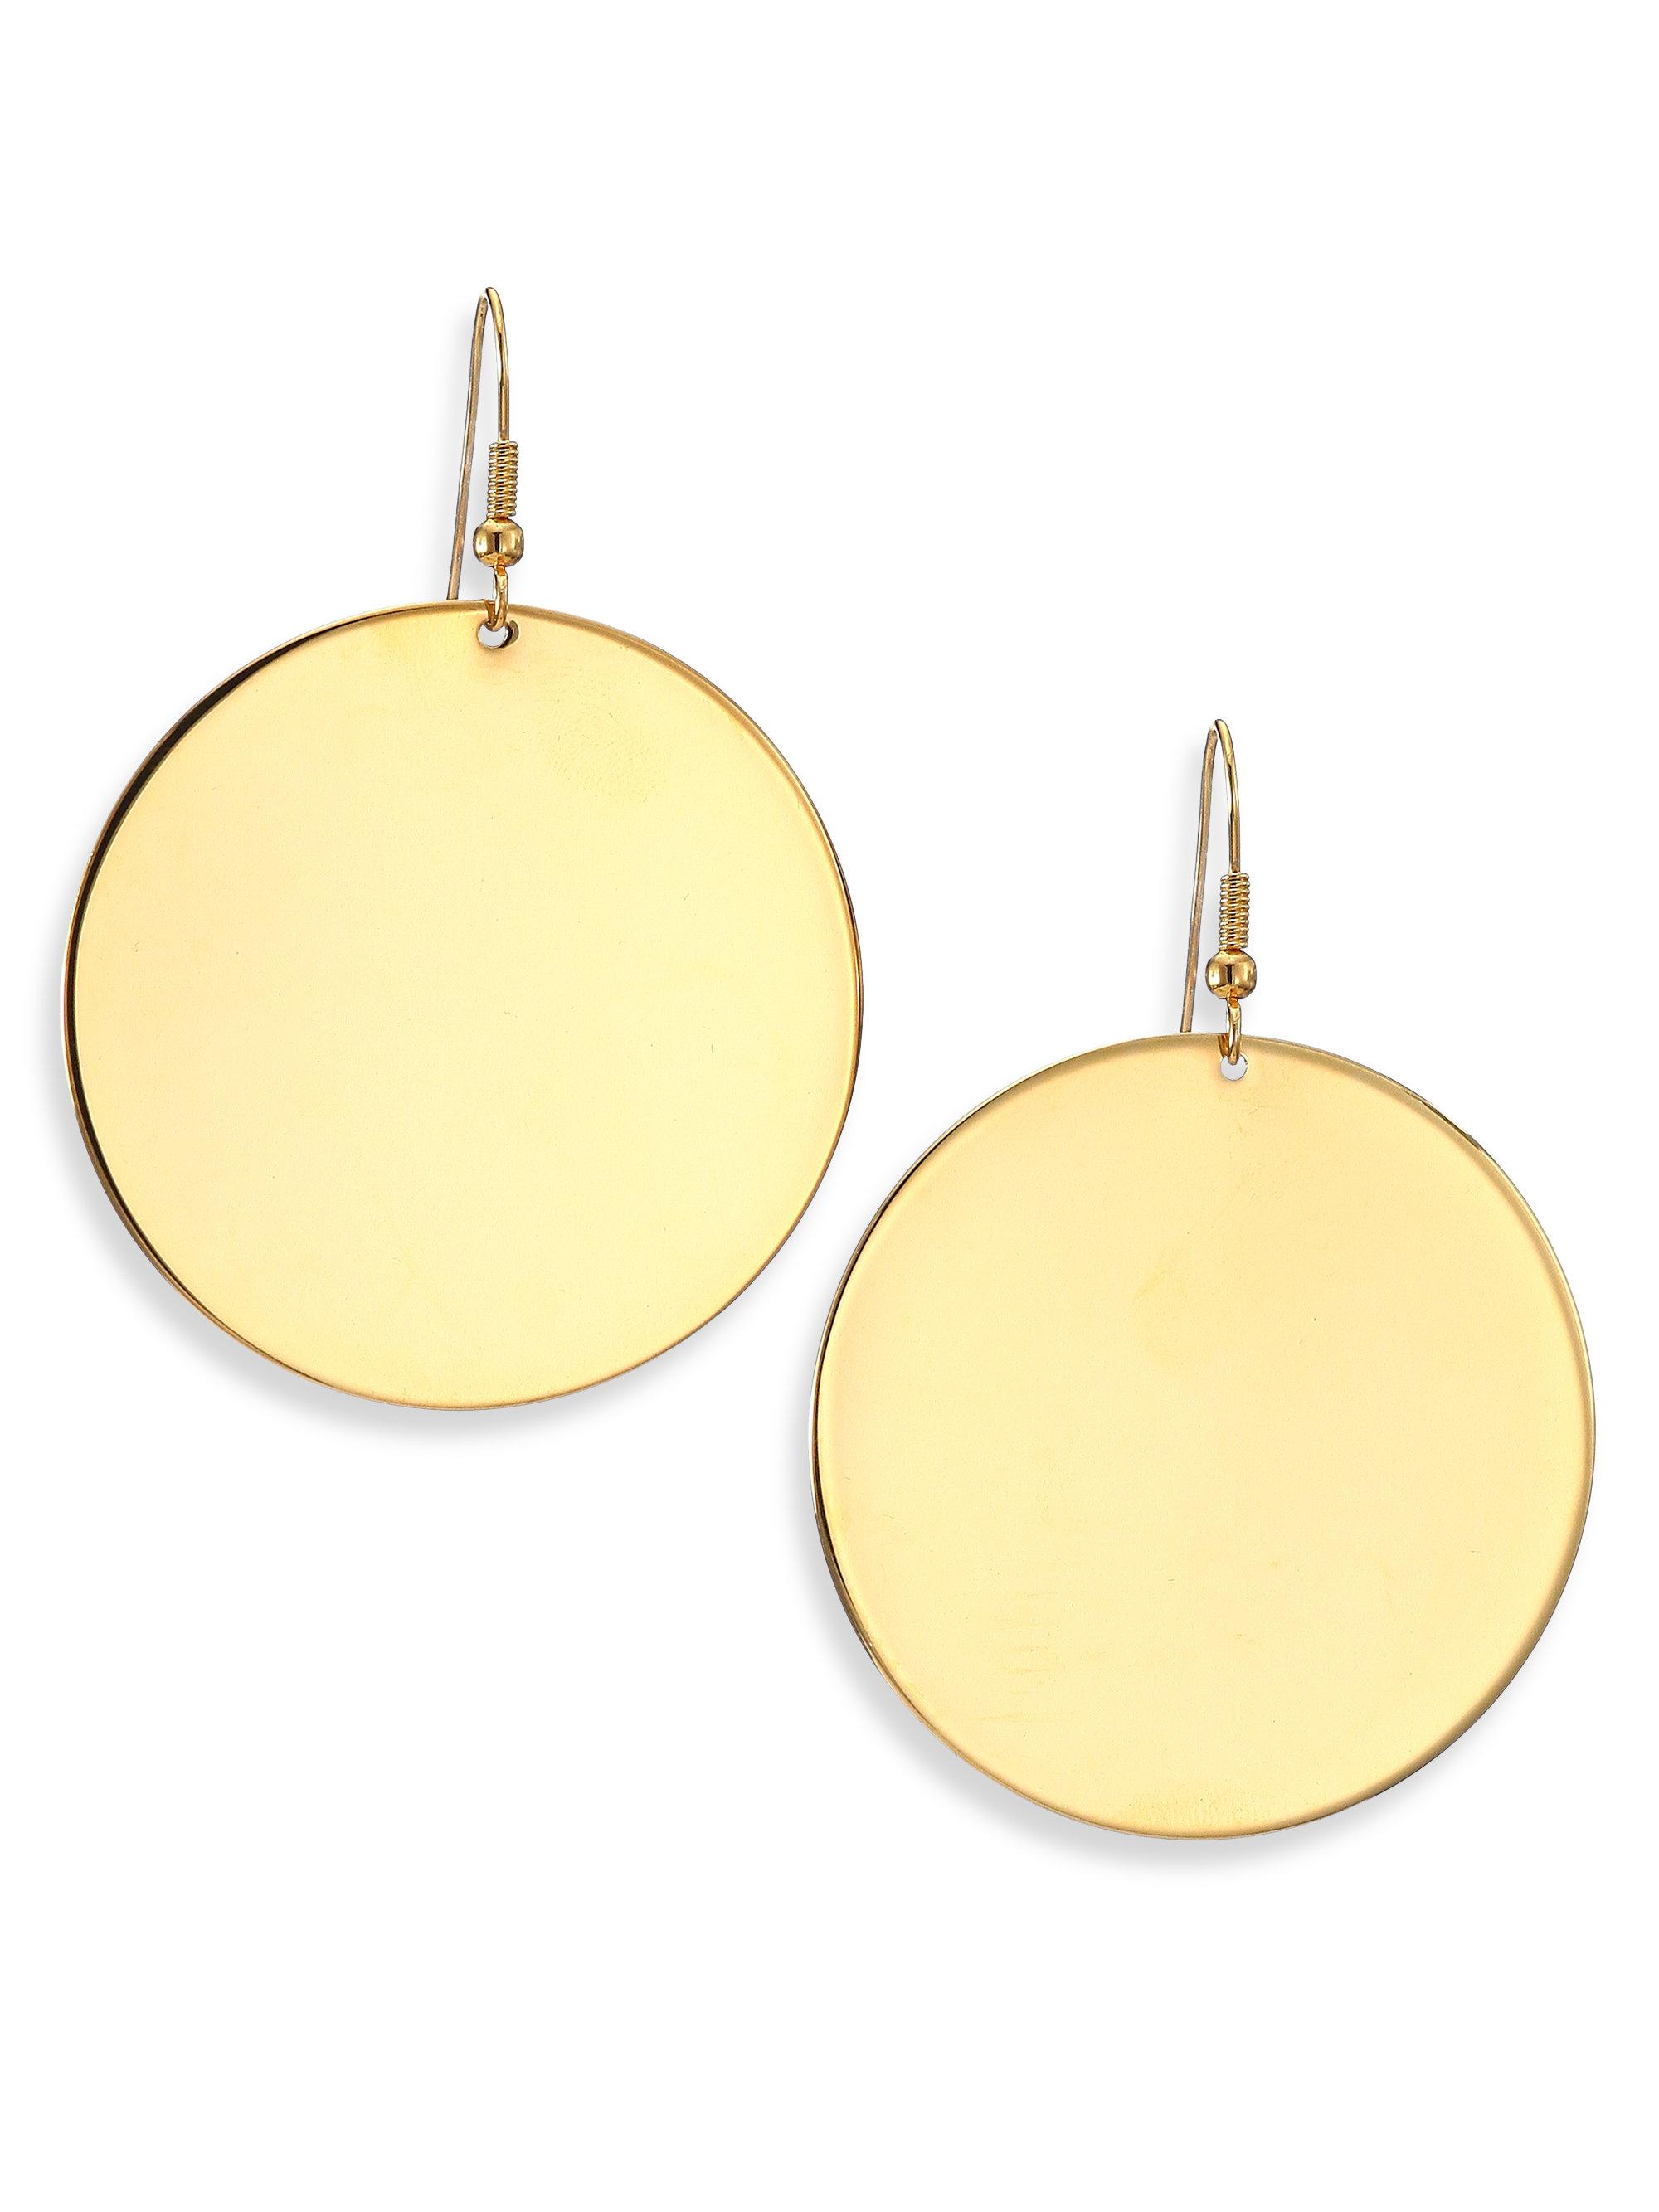 Permalink to Sterling Silver Disc Earrings